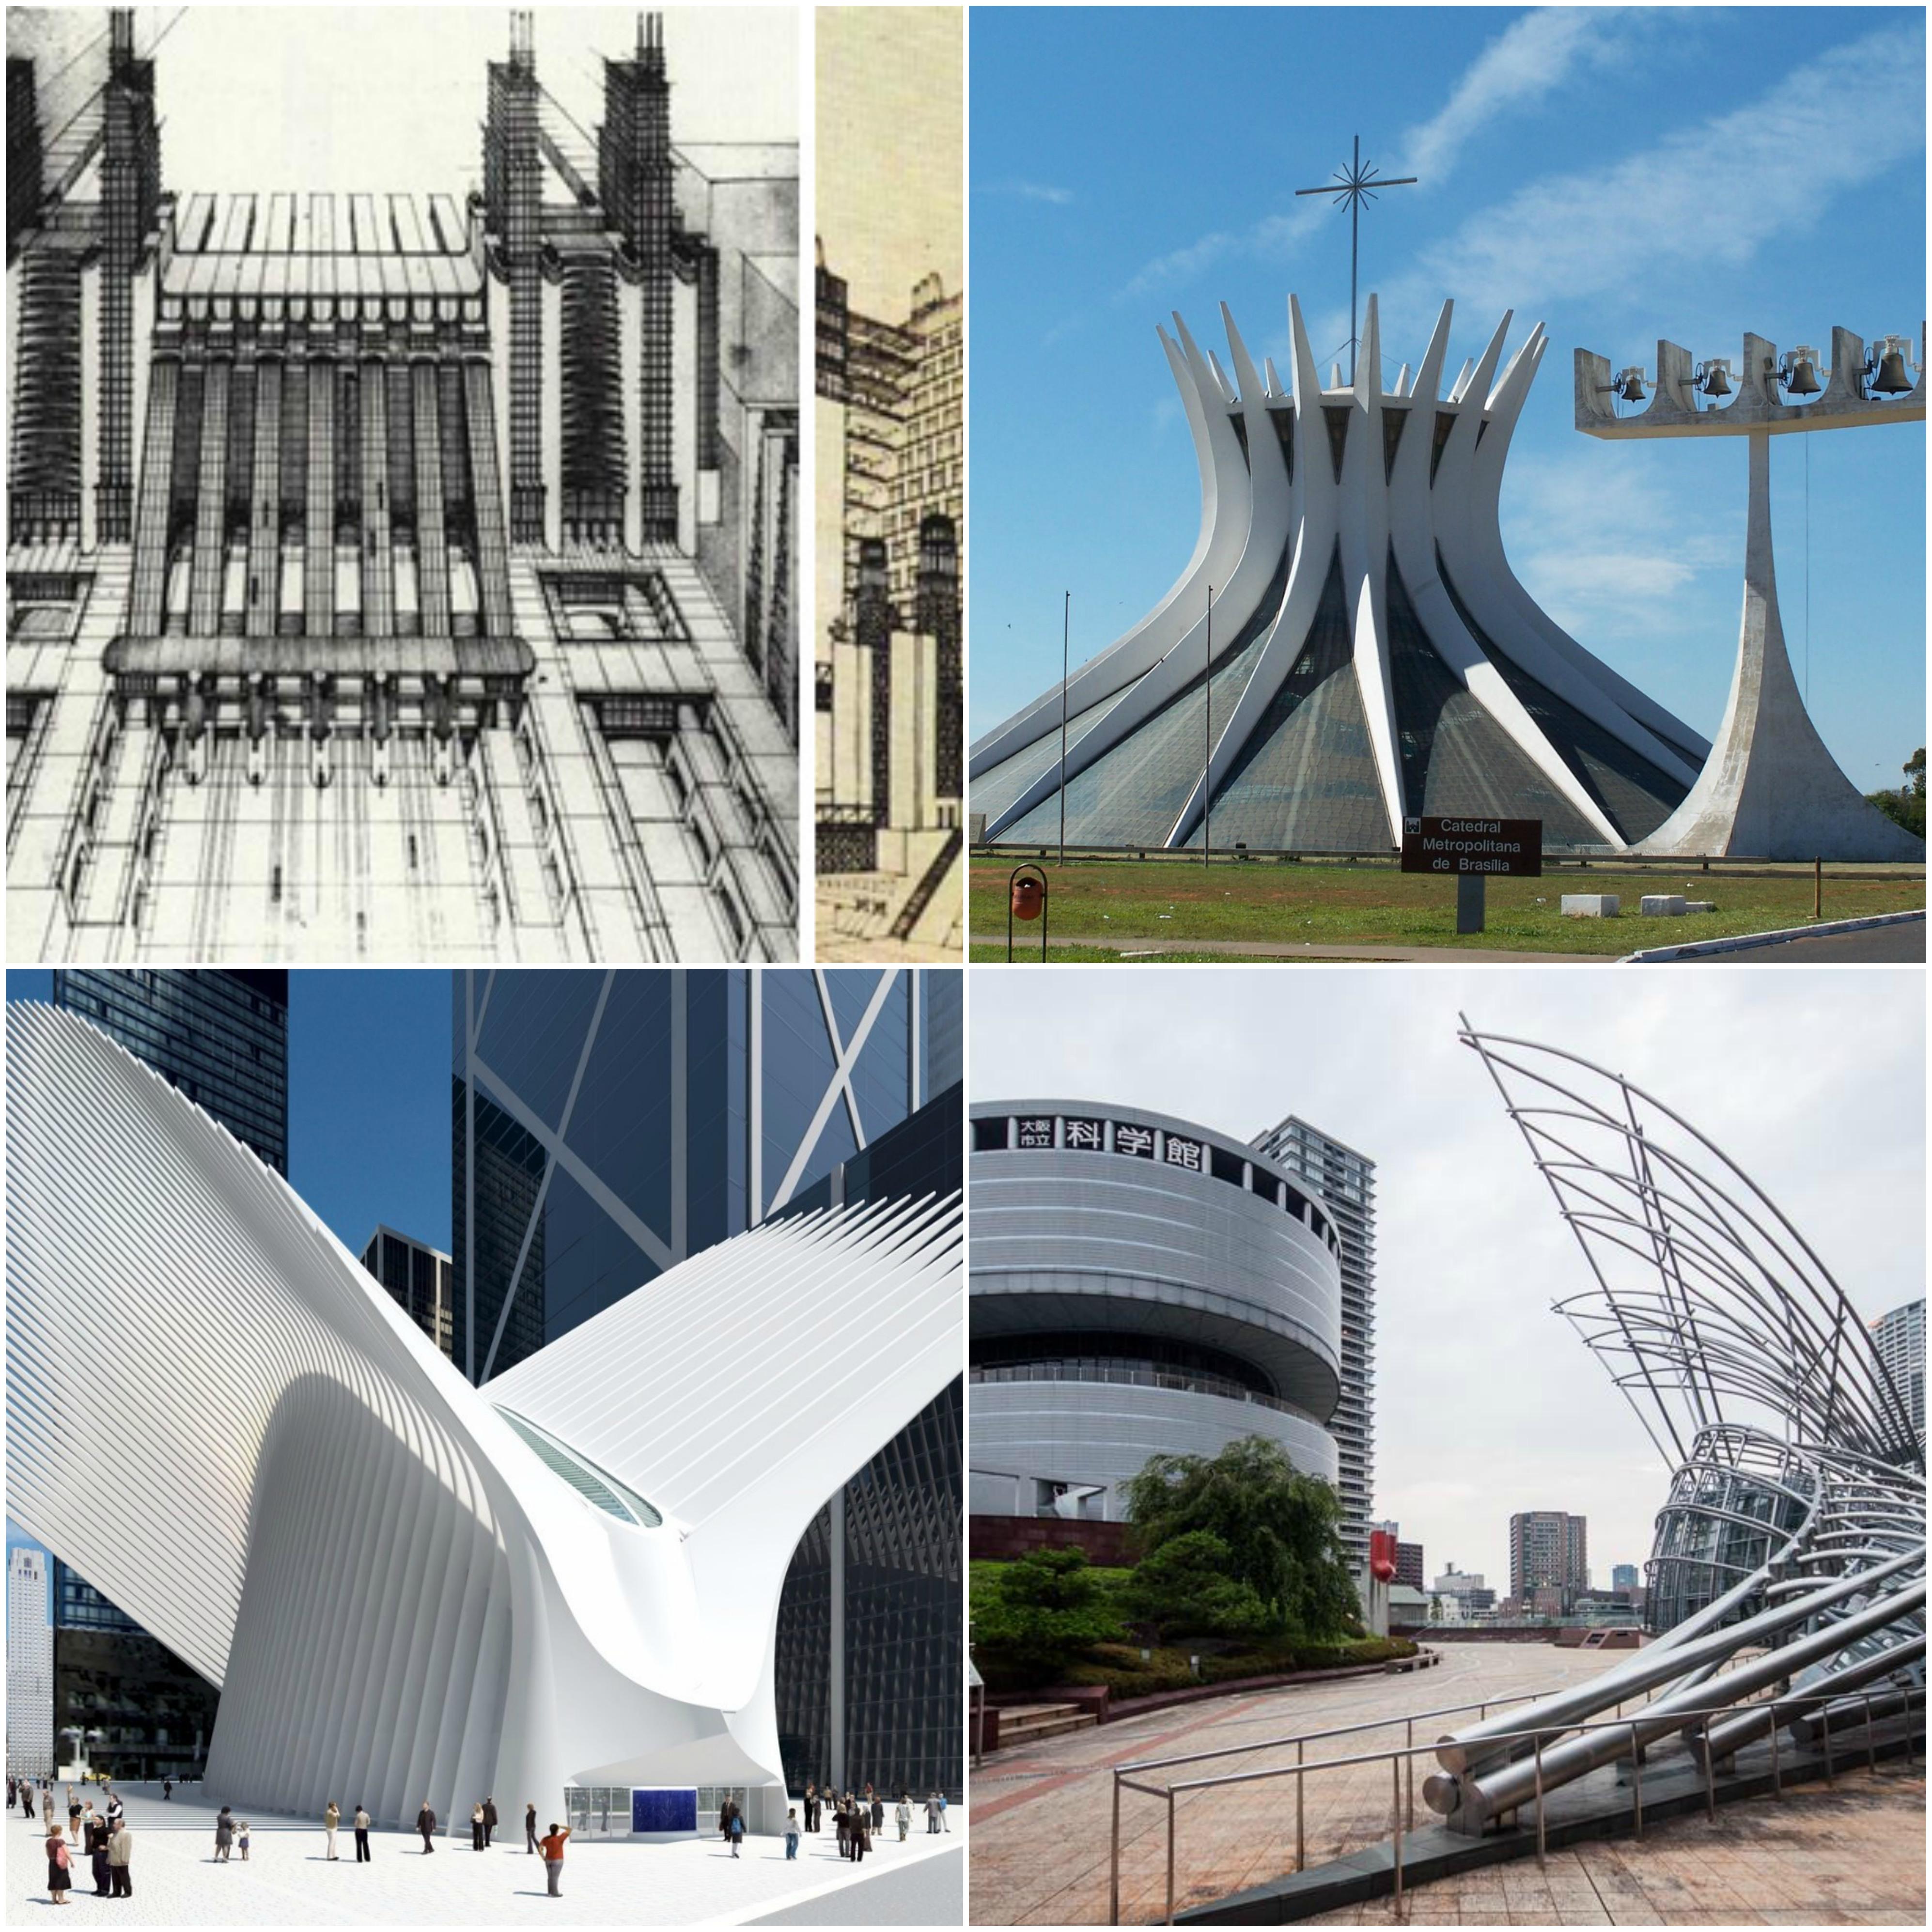 Arquitectura futurista art culos de arquitectura for Articulos de arquitectura 2015